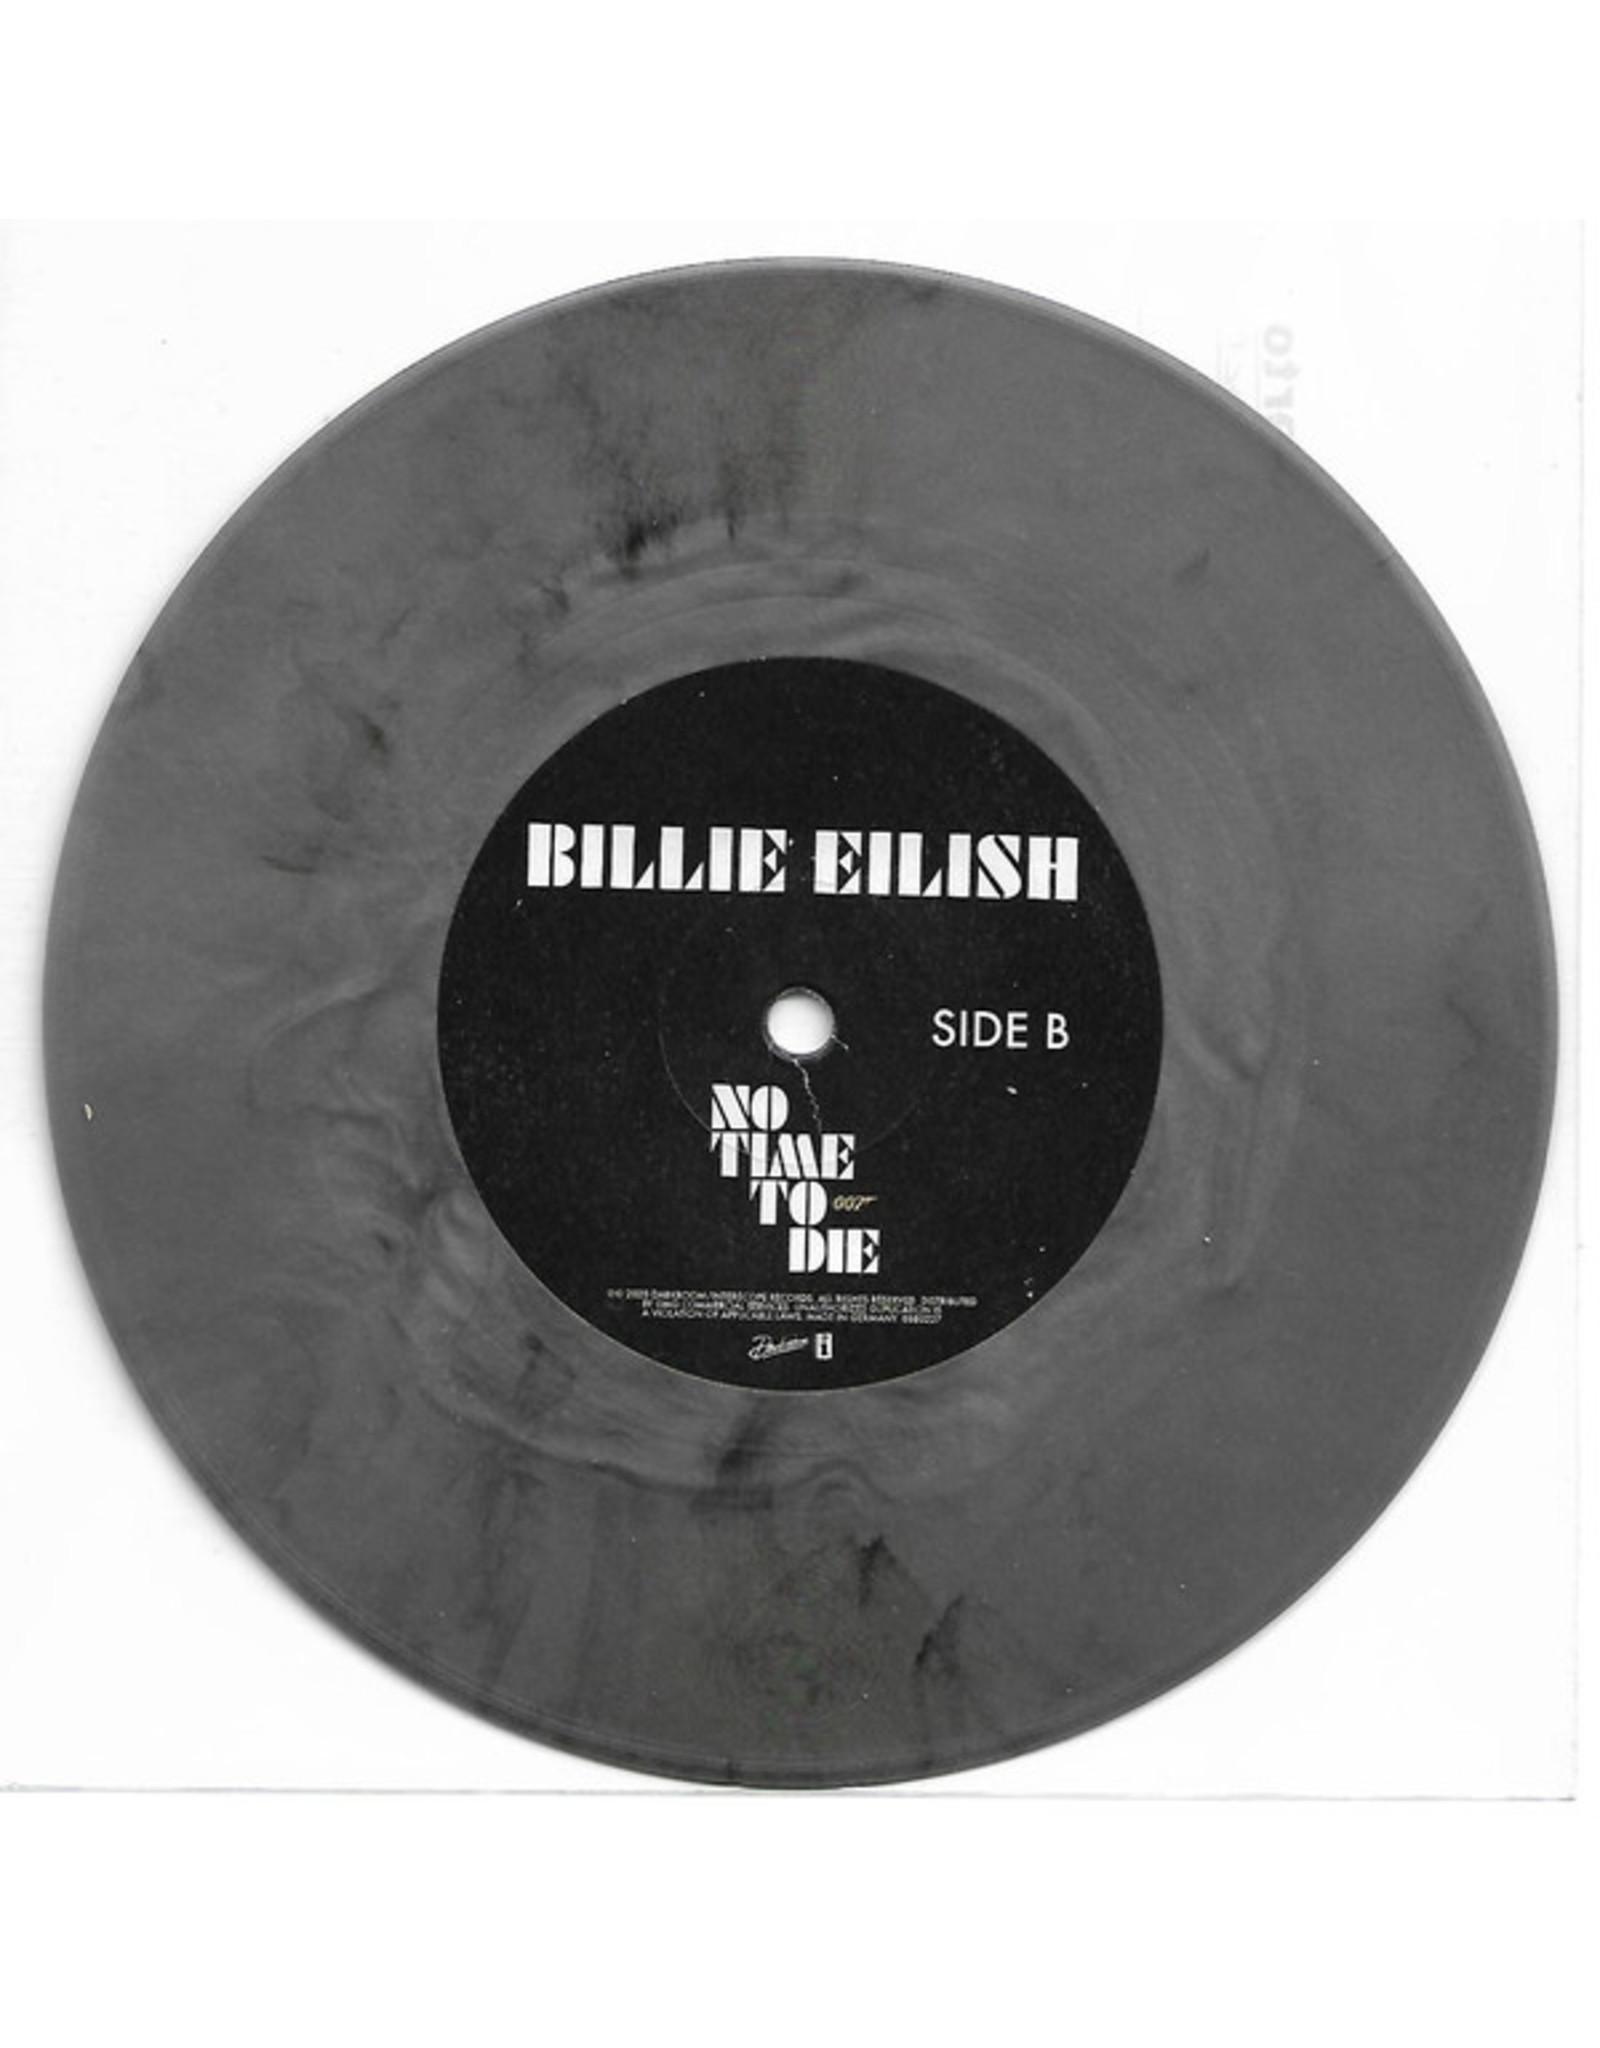 Billie Eilish - No Time To Die (Exclusive Smoke Vinyl)